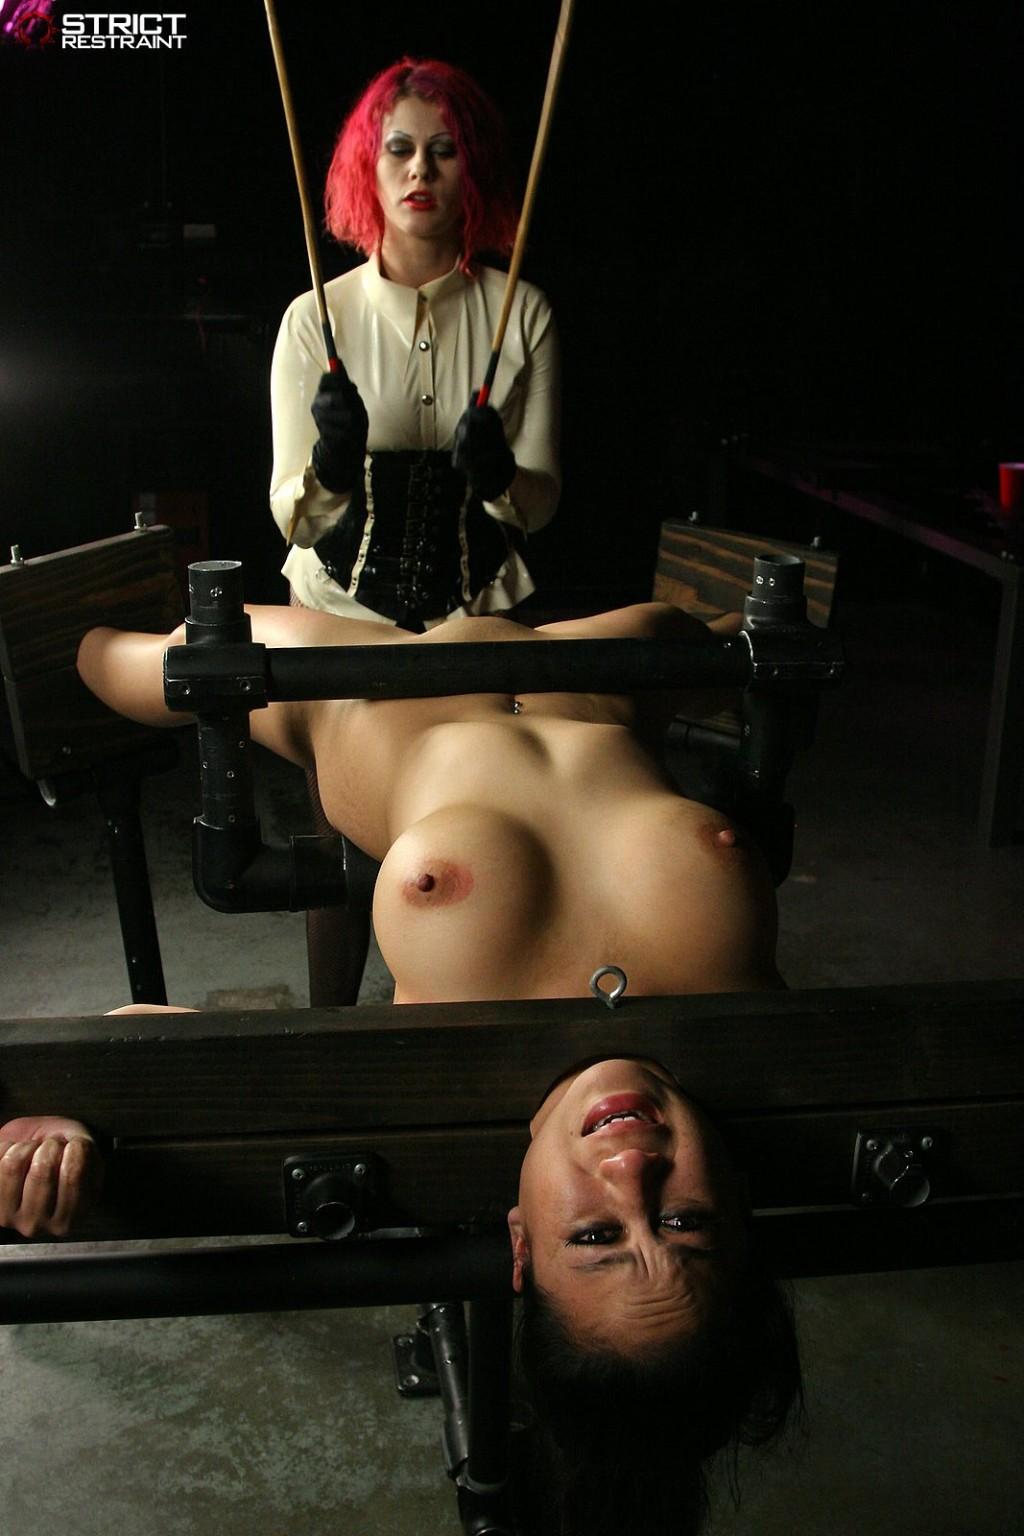 Violetta opens the tight backdoor